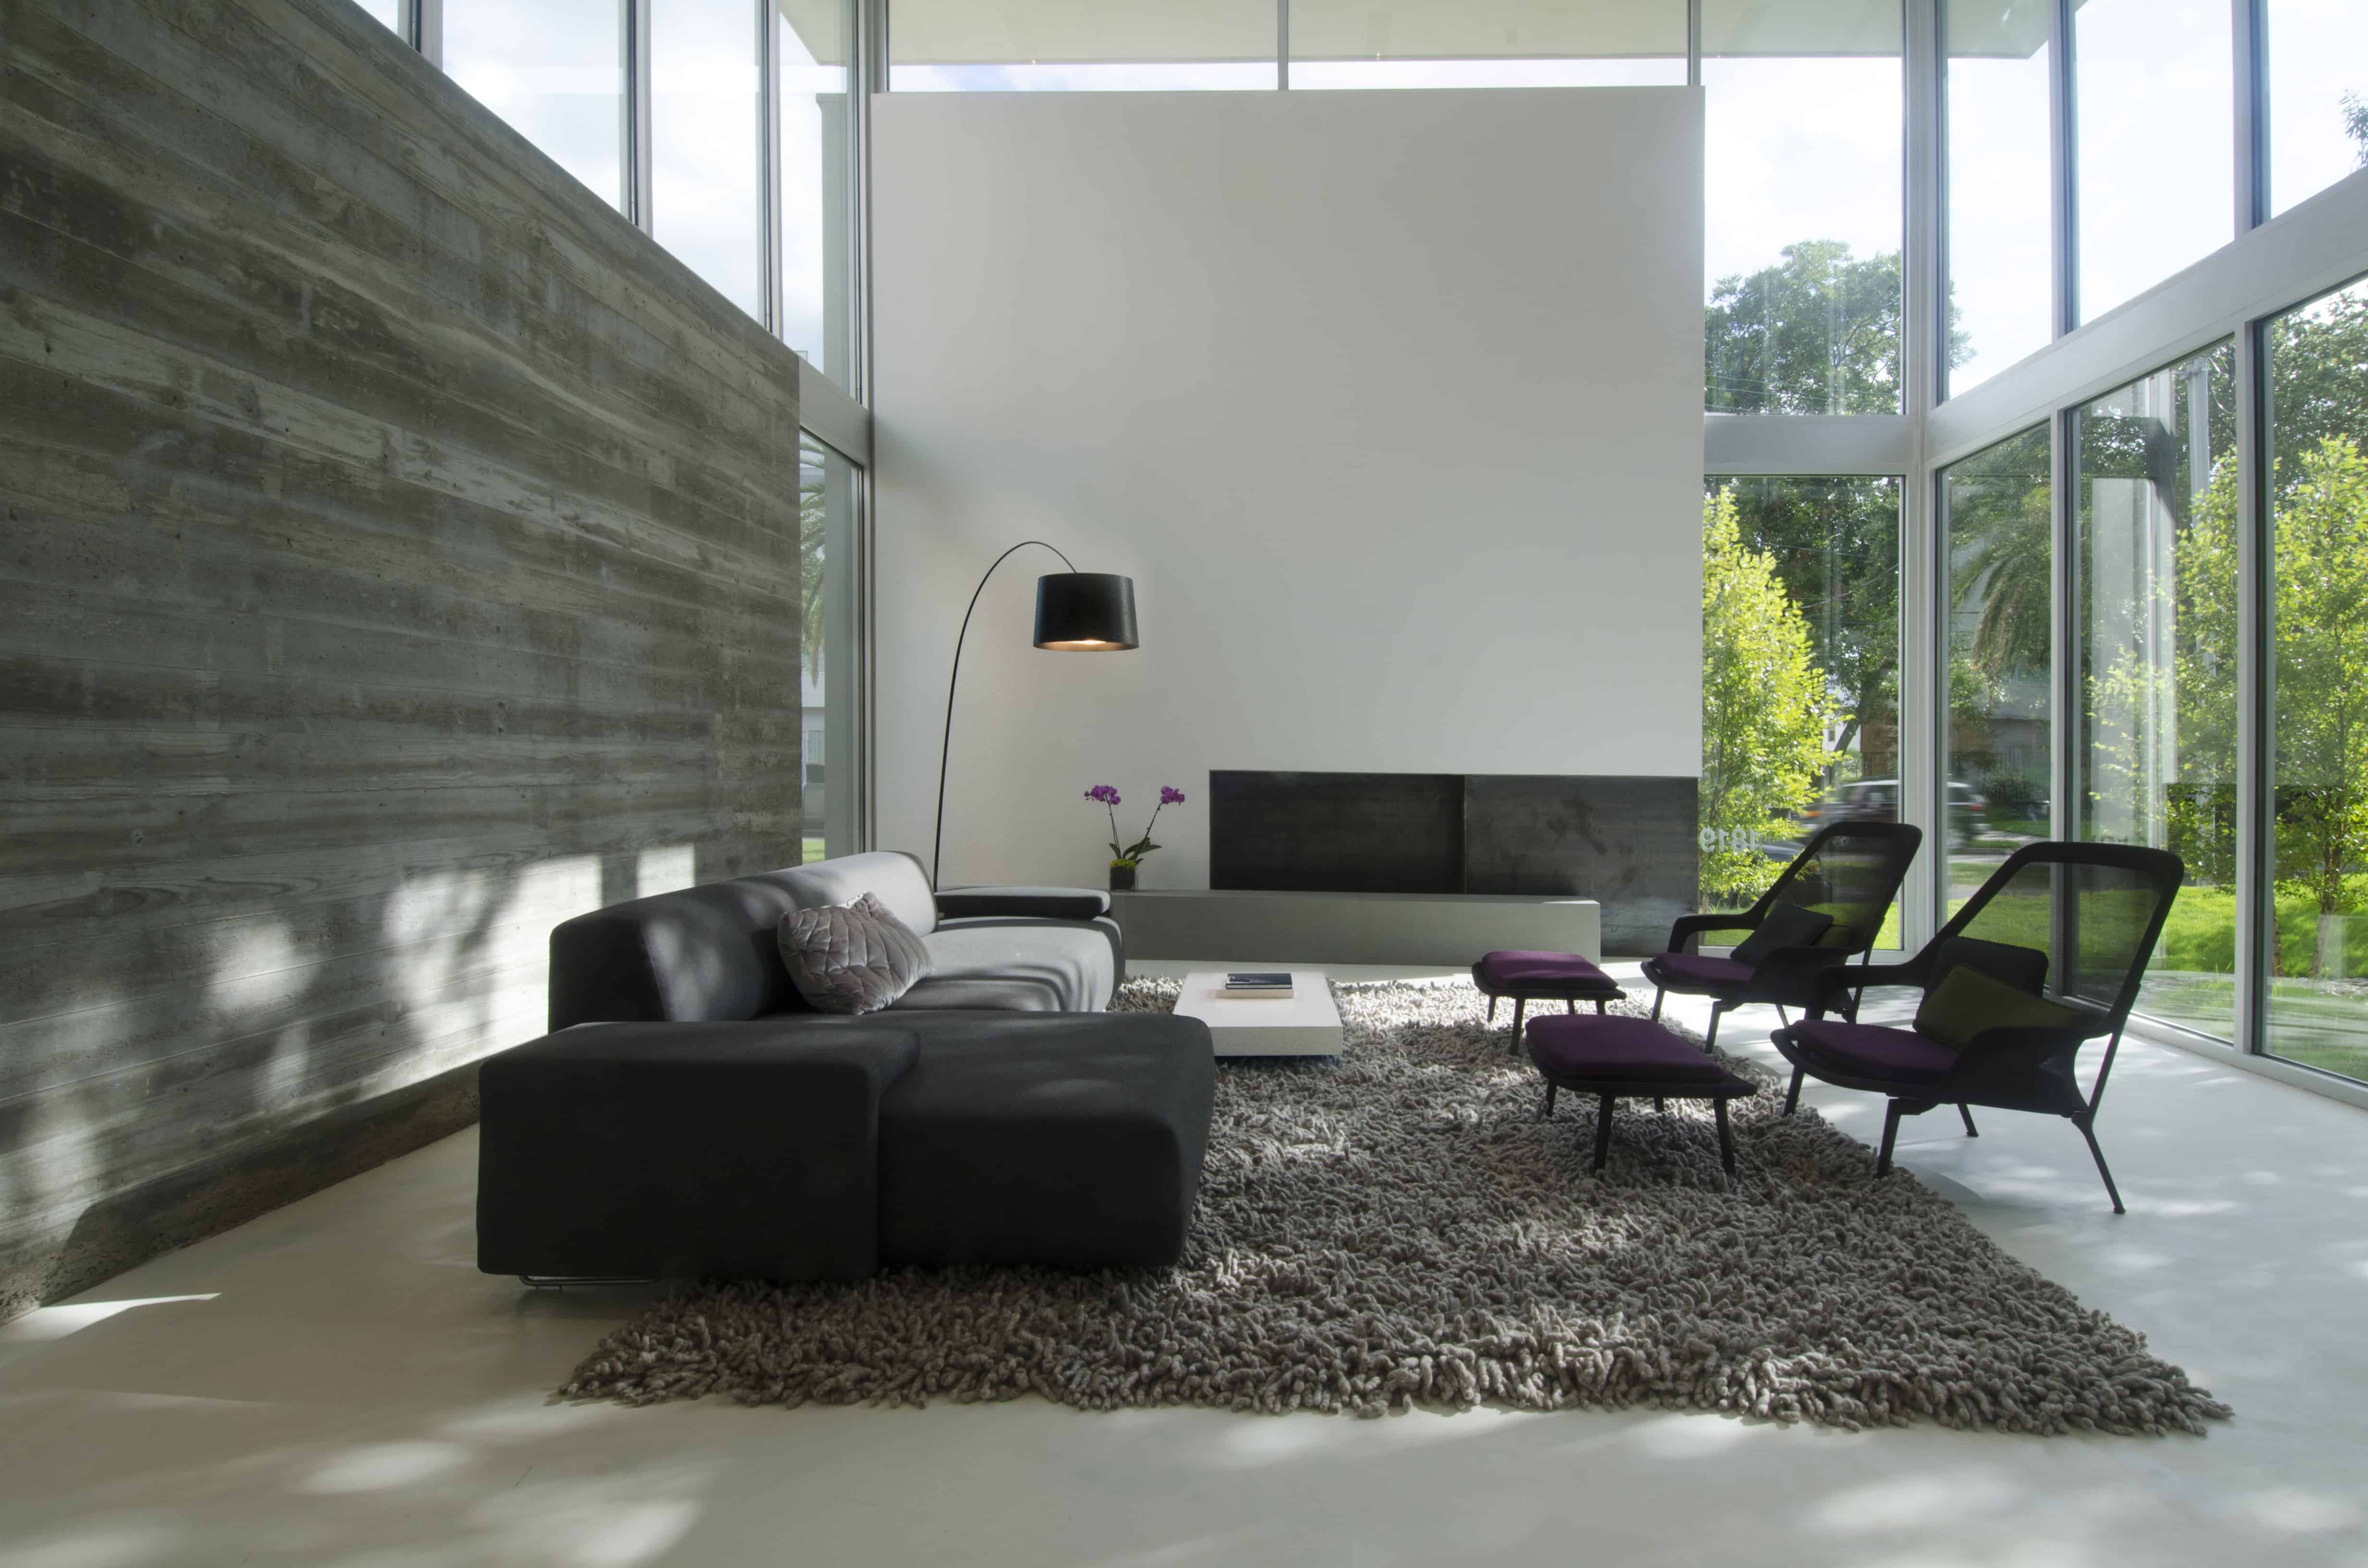 Sleek Houston Modern Home living with cast concrete